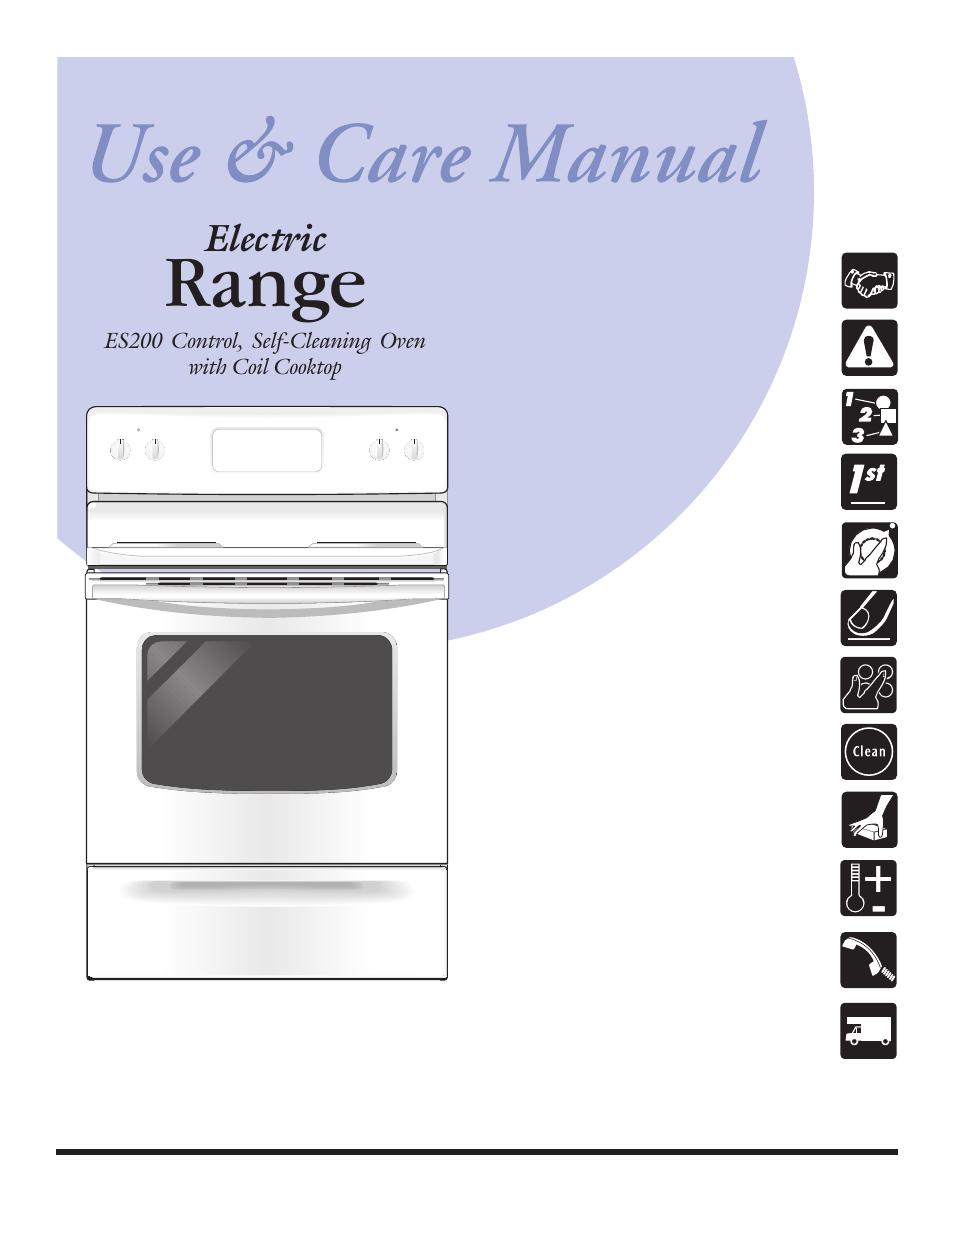 Frigidaire Es200 User Manual Manual Guide